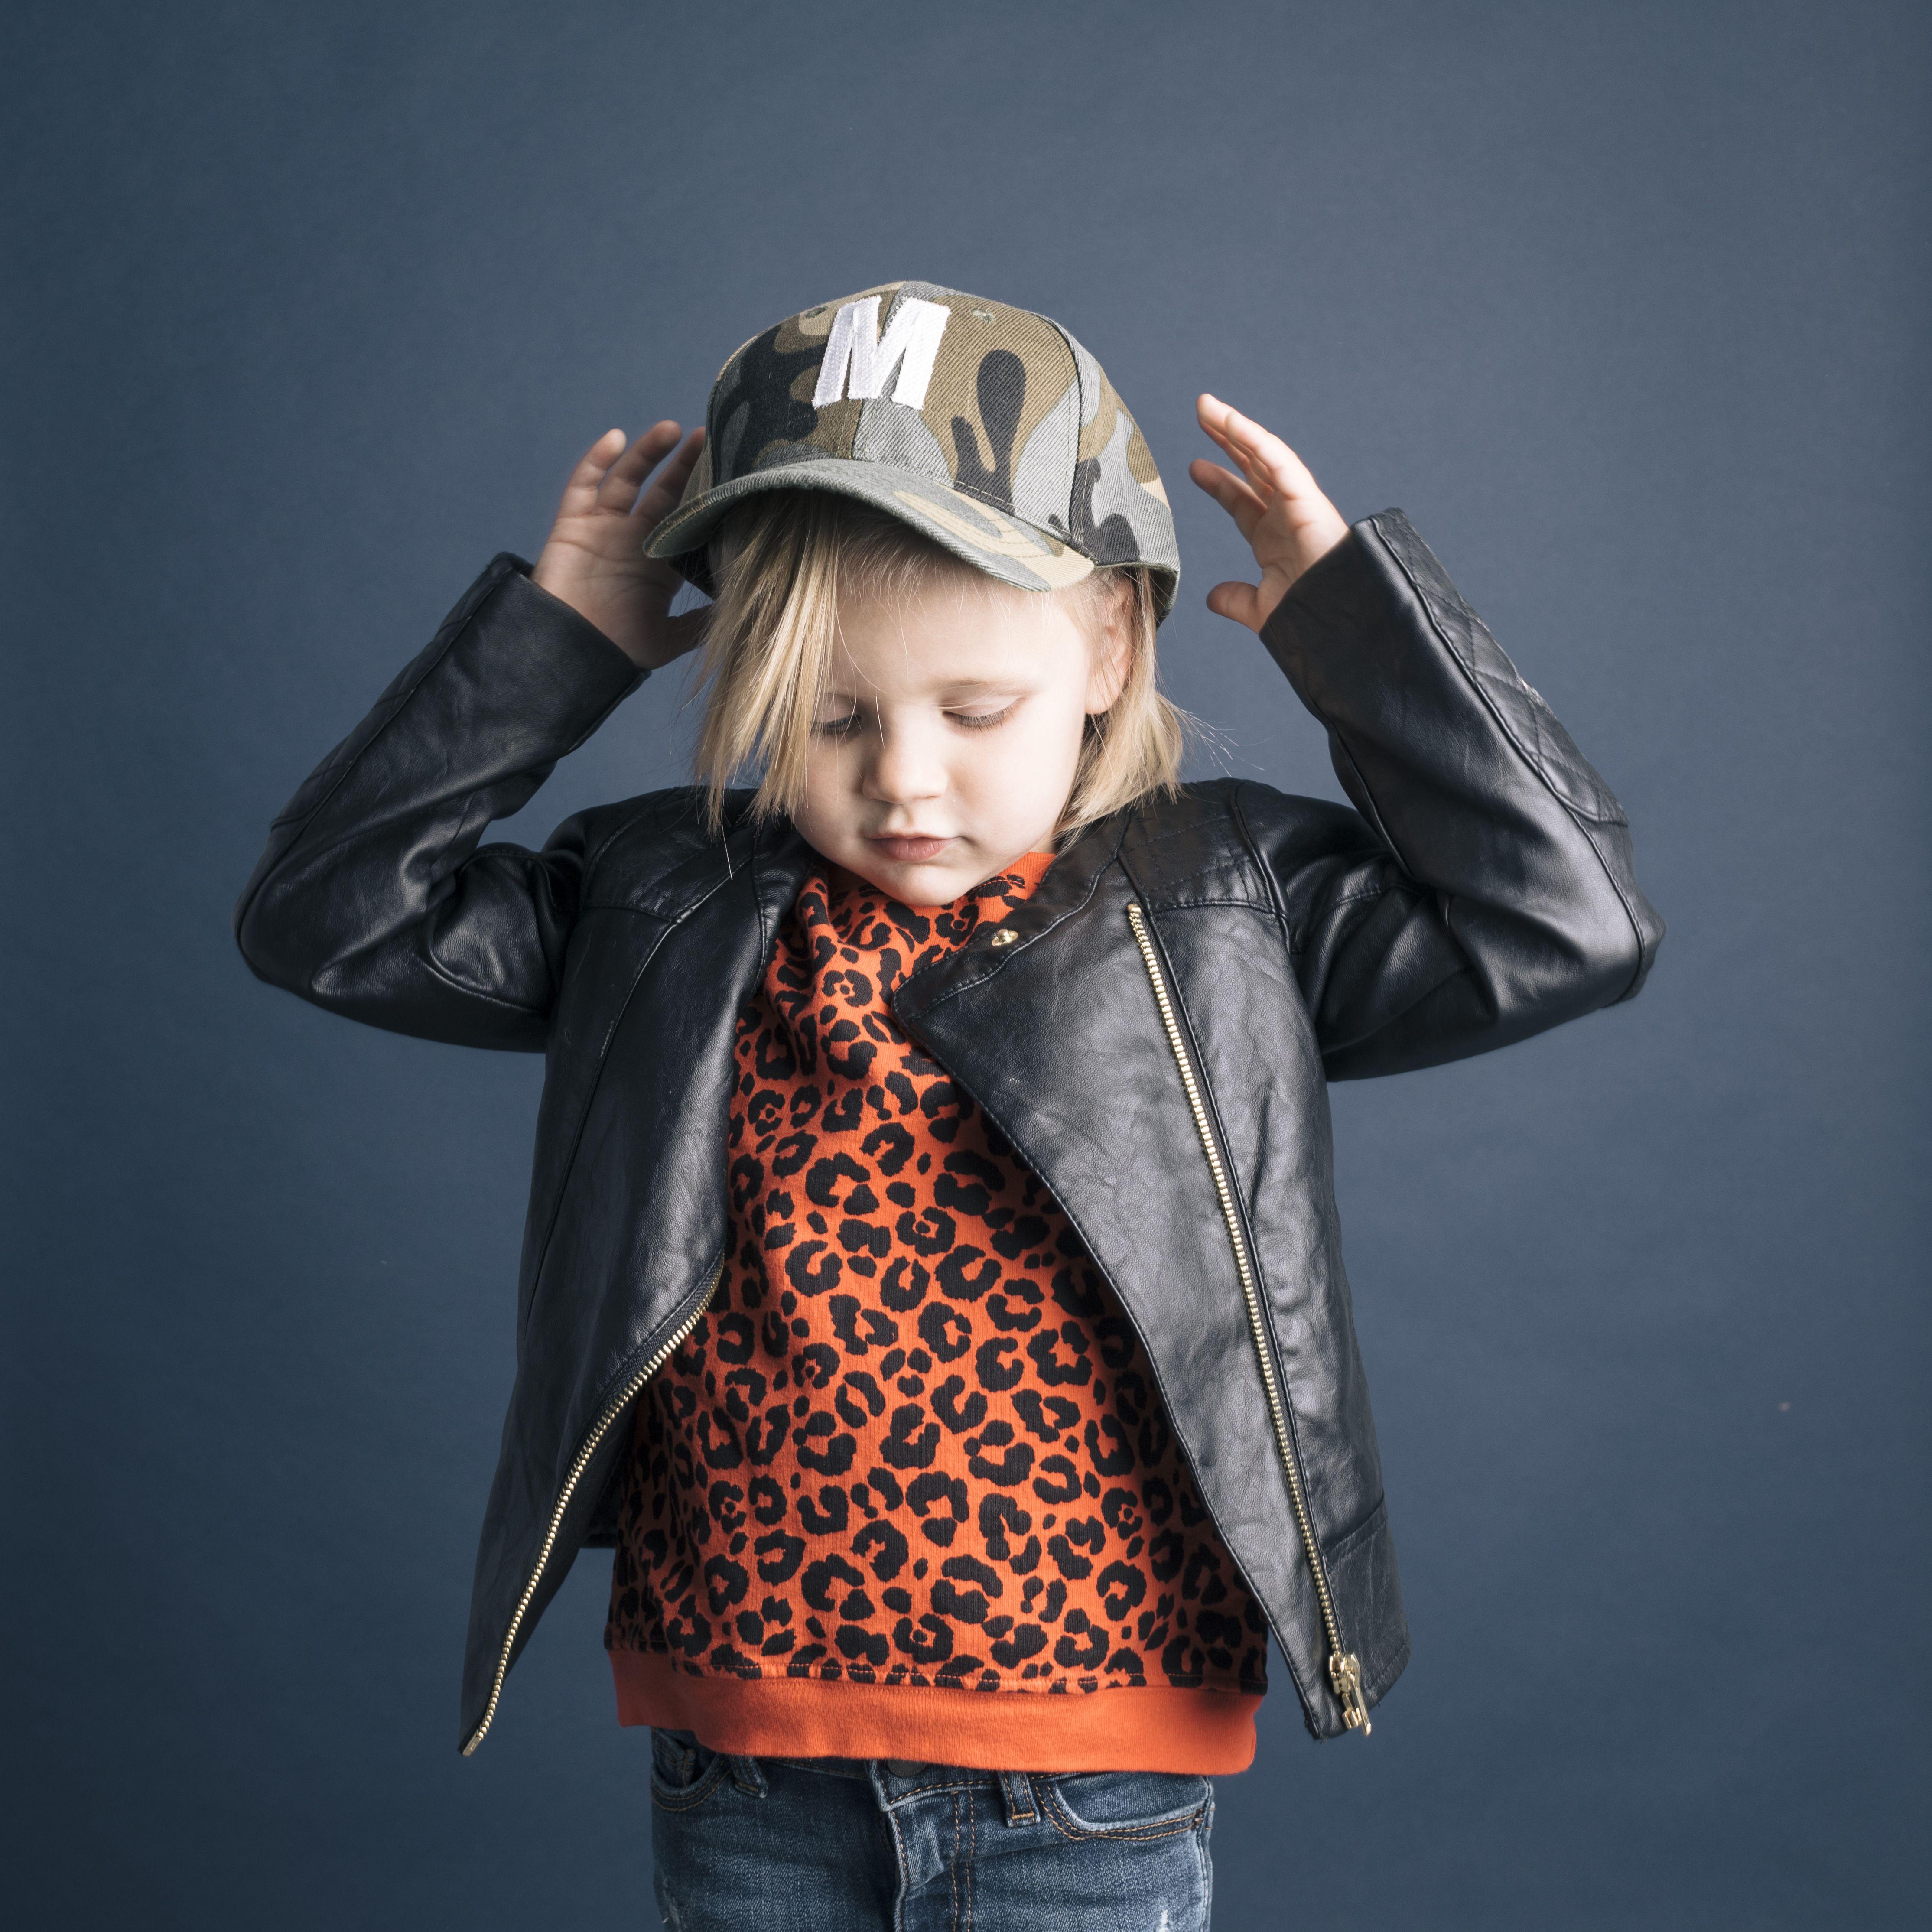 Orange Cheetah Print Sweatshirt Paird With A Black Leather Jacket And A Camp Hat Cheetah Print Sweatshirt Embellished Denim Toddler Fashion [ 4458 x 4458 Pixel ]